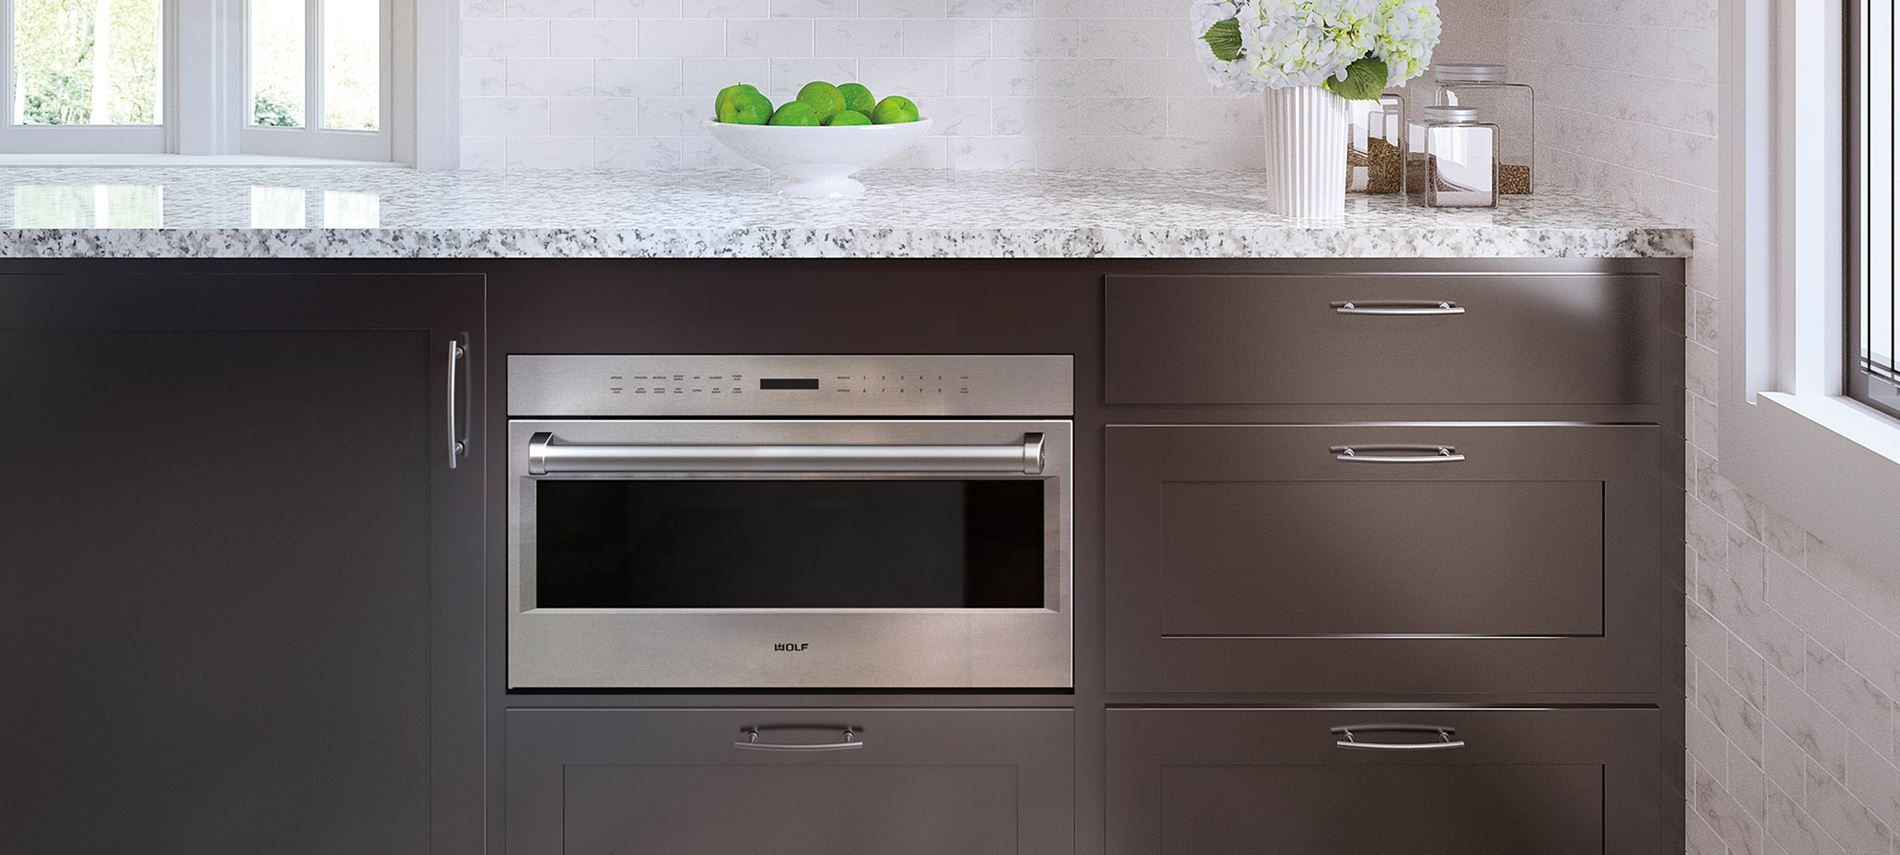 Wolf 30 E Series Professional Drop Down Door Microwave Oven